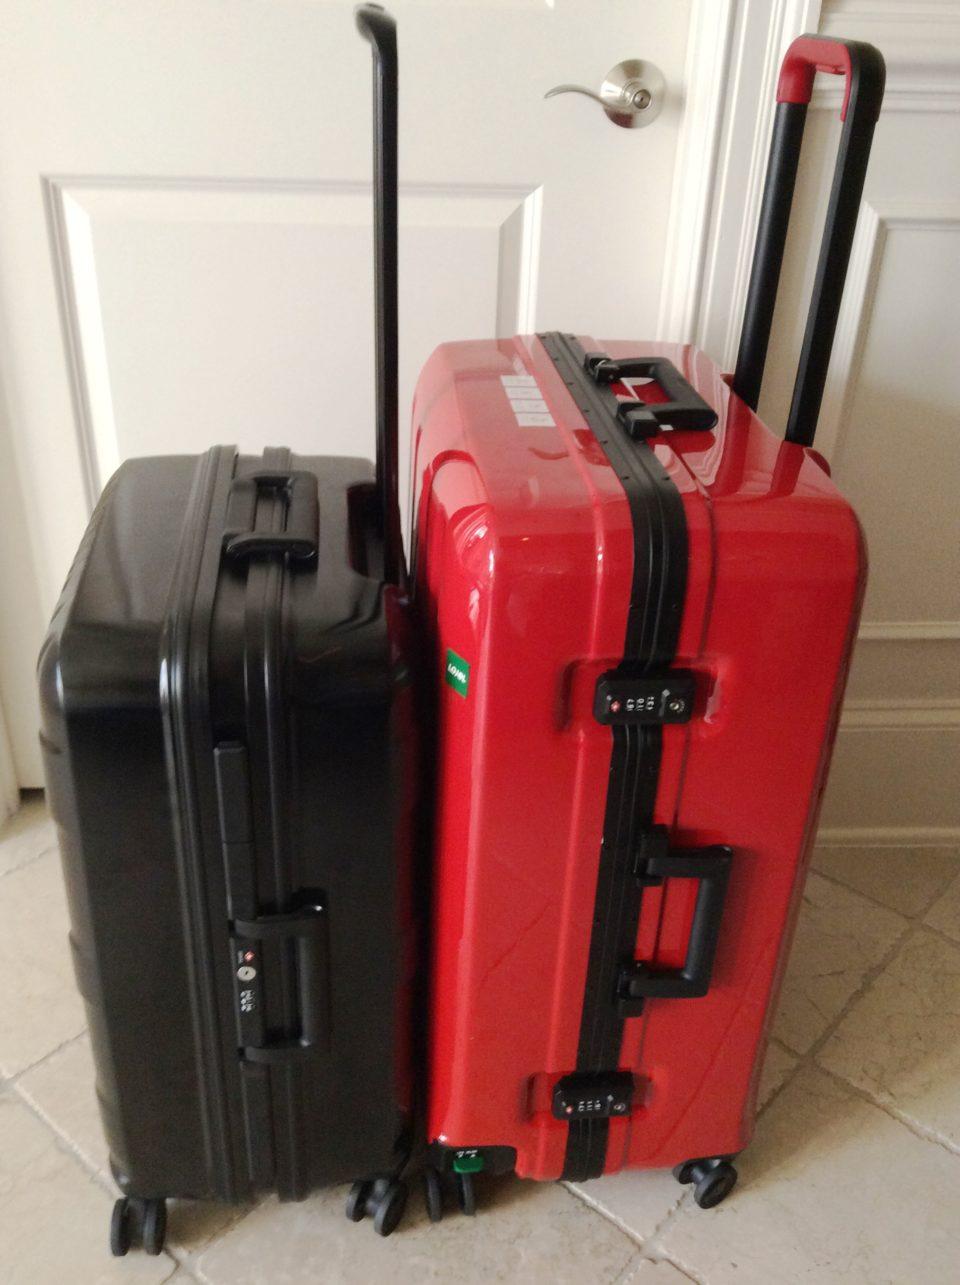 Lojel Luggage ~ The red Novigo and the black Kozmos suitcases